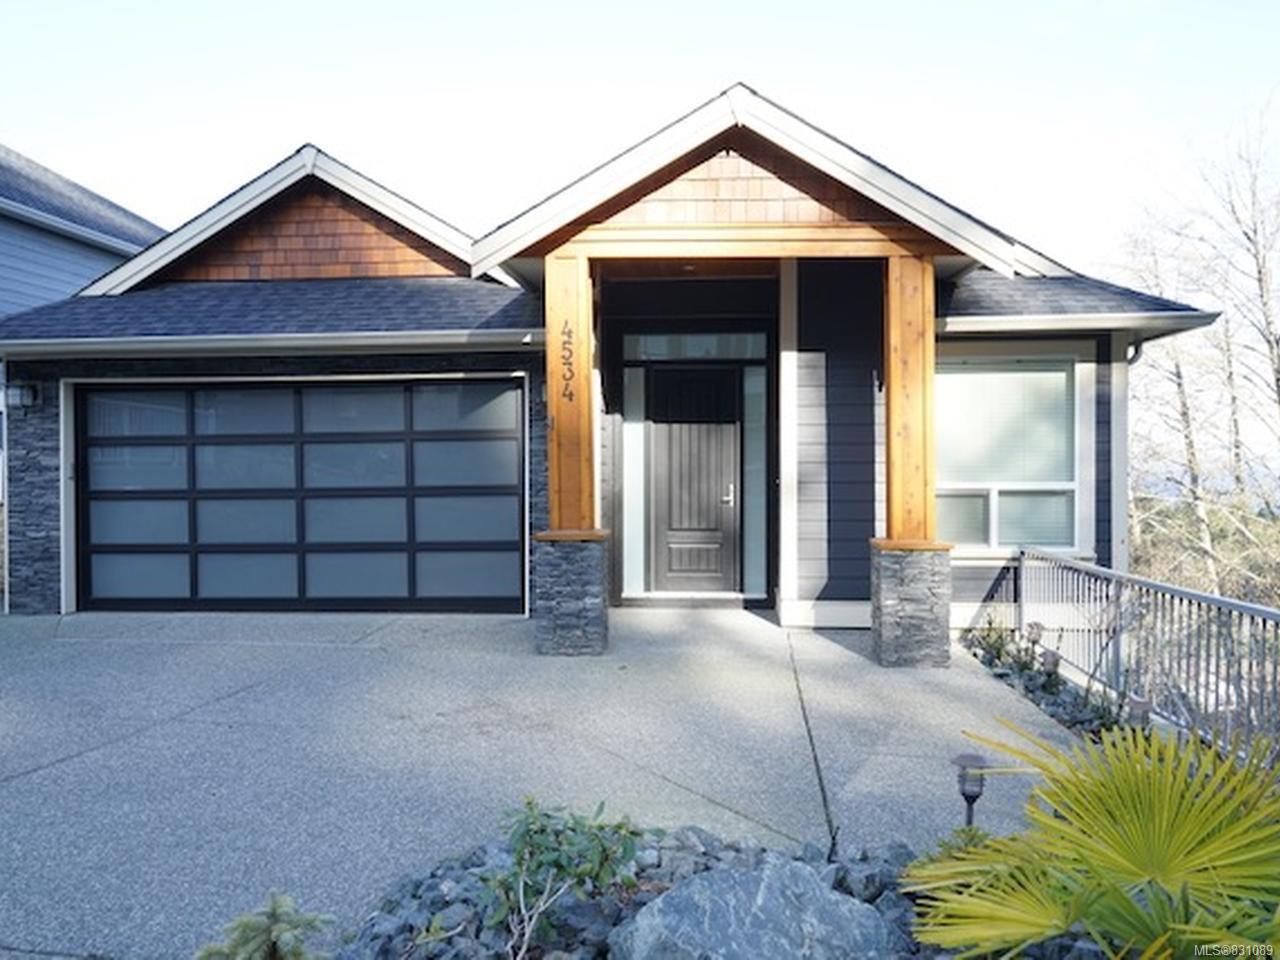 Main Photo: 4534 Laguna Way in NANAIMO: Na North Nanaimo House for sale (Nanaimo)  : MLS®# 831089